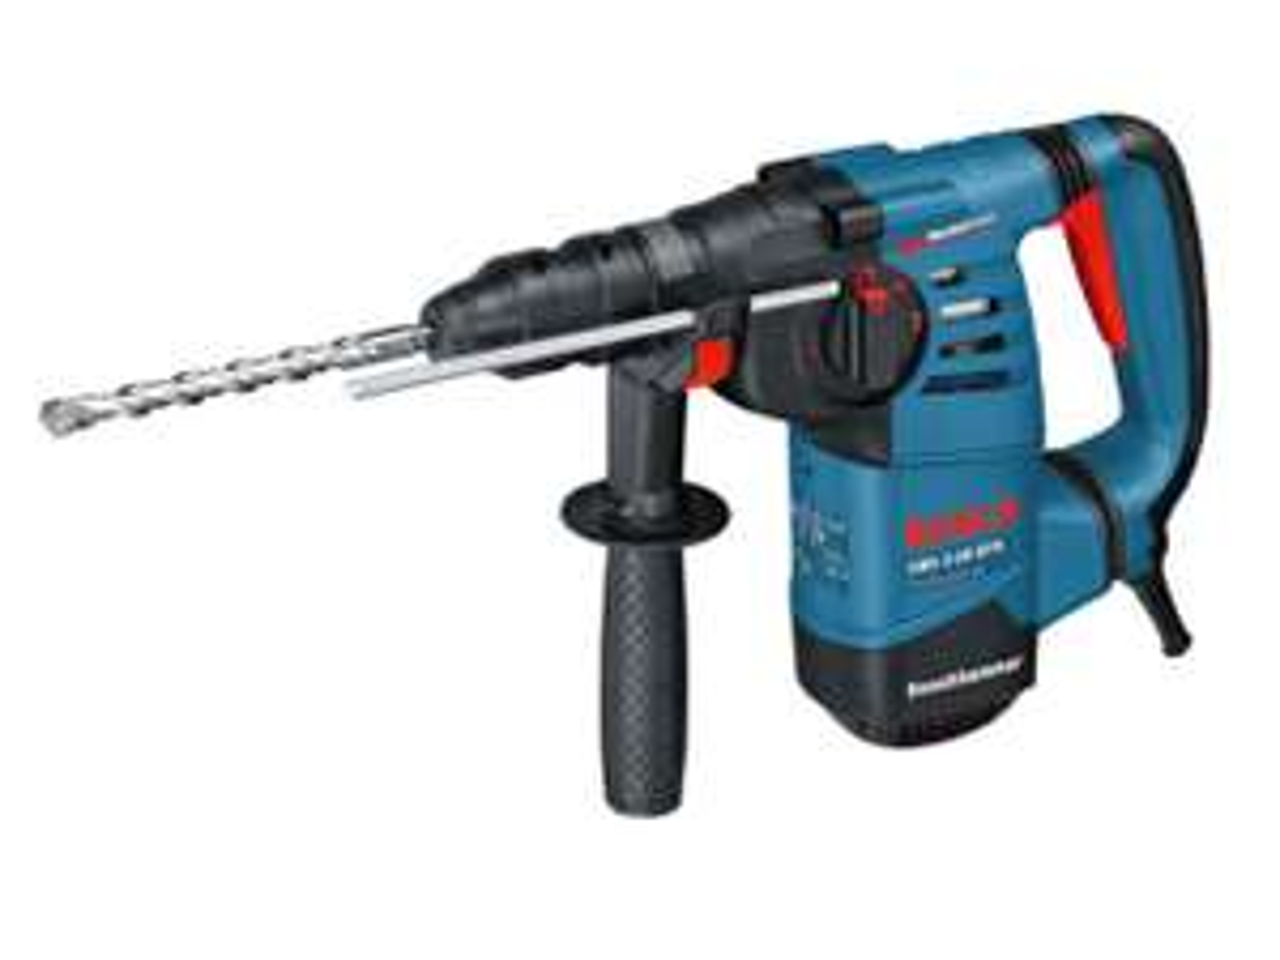 Bosch GBH 3-28 DFR SDS Plus 3kg Rotary Hammer Drill 240v 800w £244 at FFX